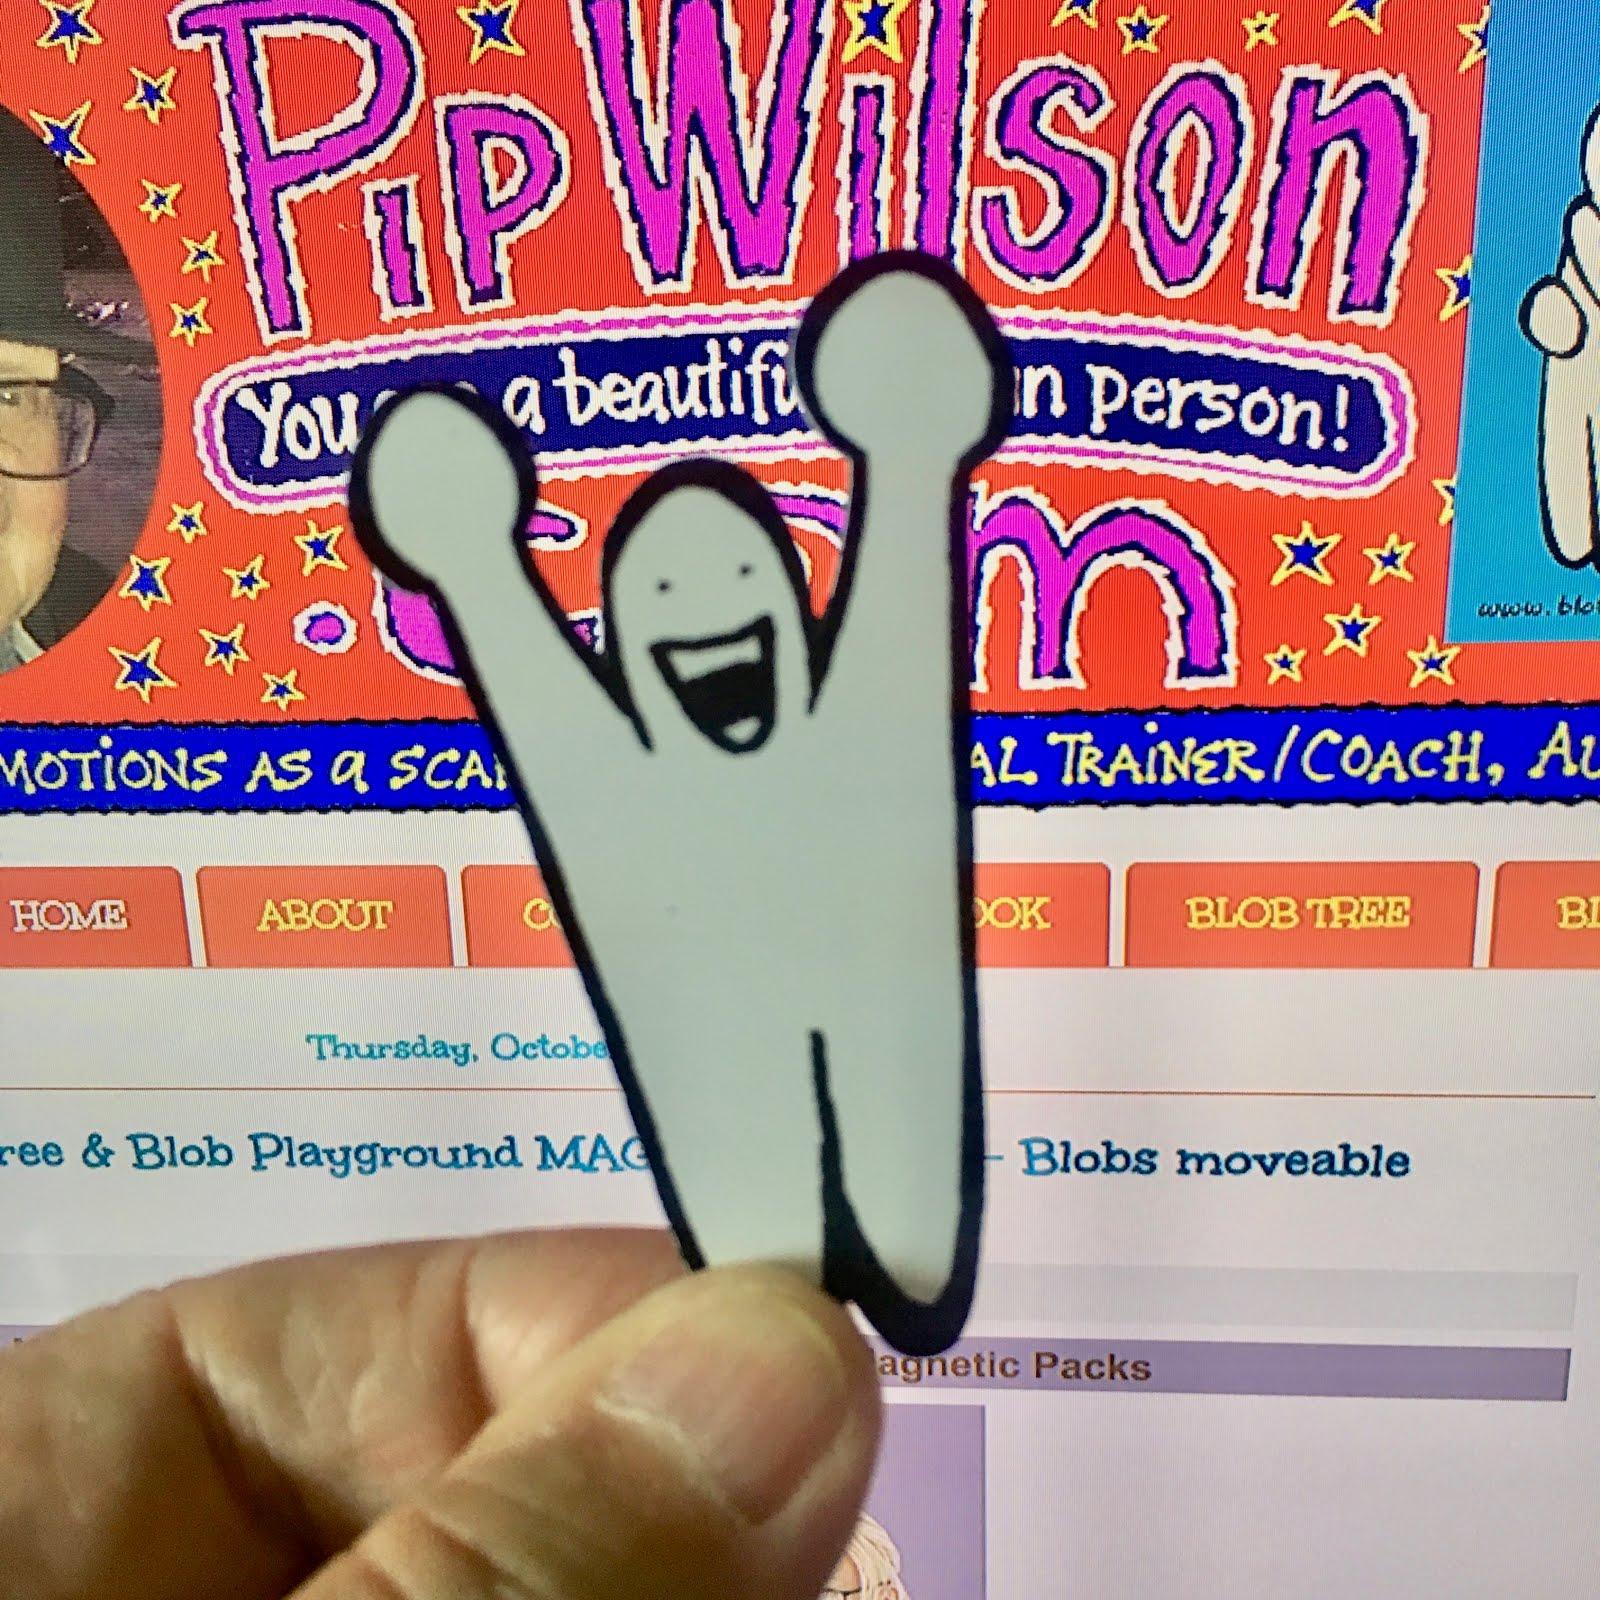 Pip Wilson Bhp: Blob Tree & Blob Playgrond Magnetic Board